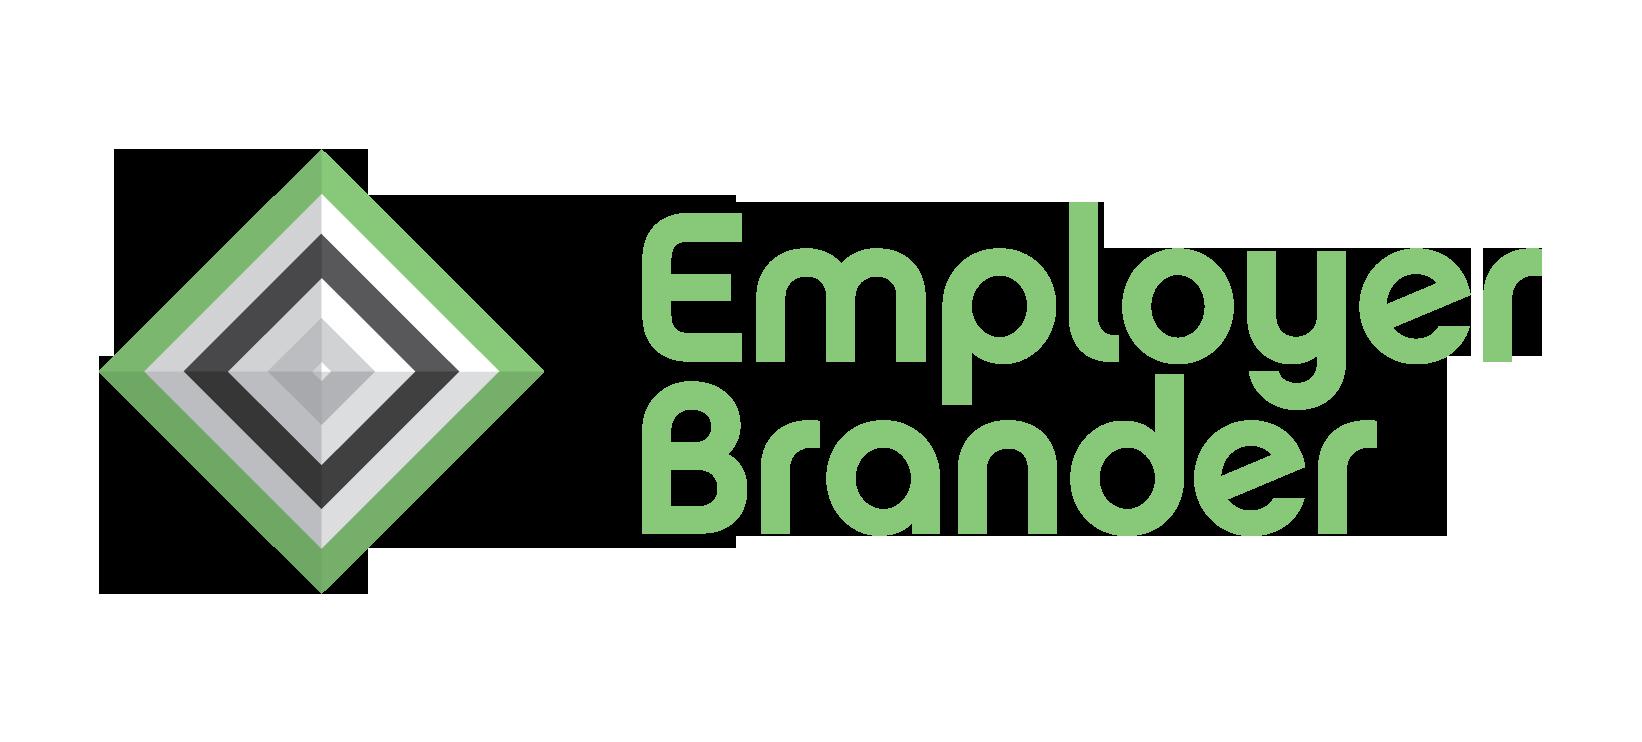 Employer Brander